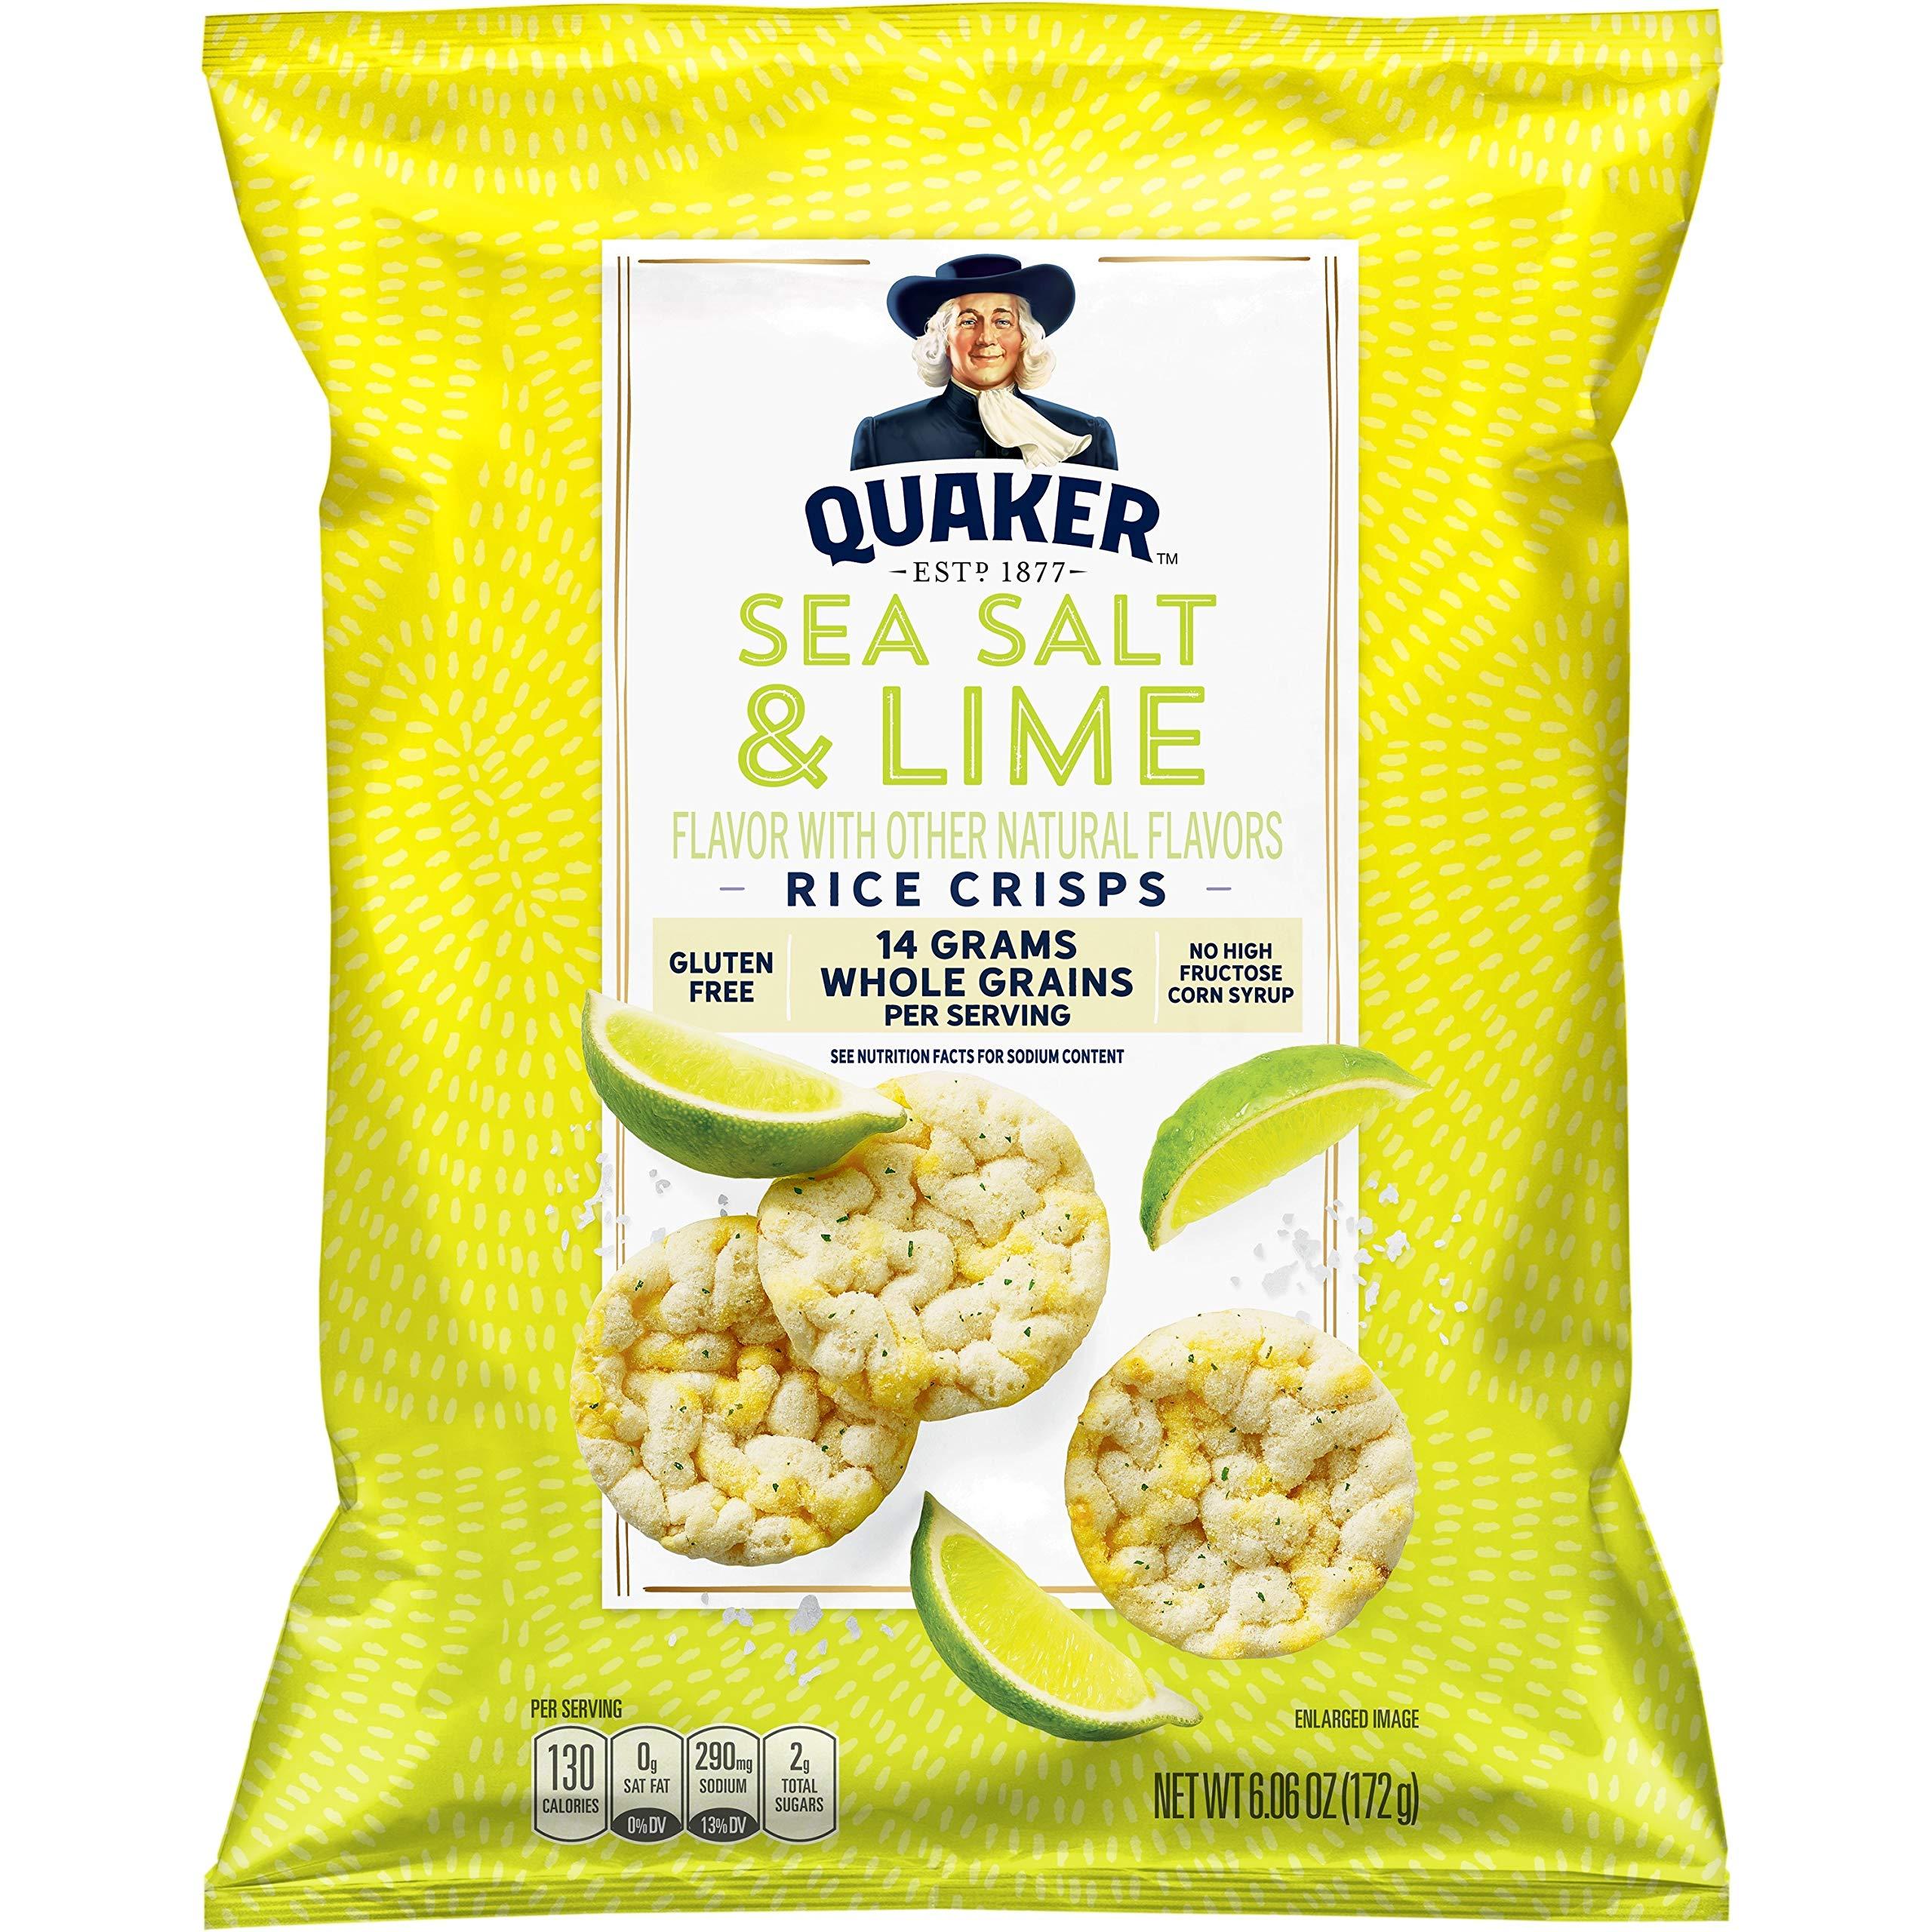 Quaker Rice Crisps, Sea Salt & Lime, 6.06 oz Bag (Packaging May Vary)